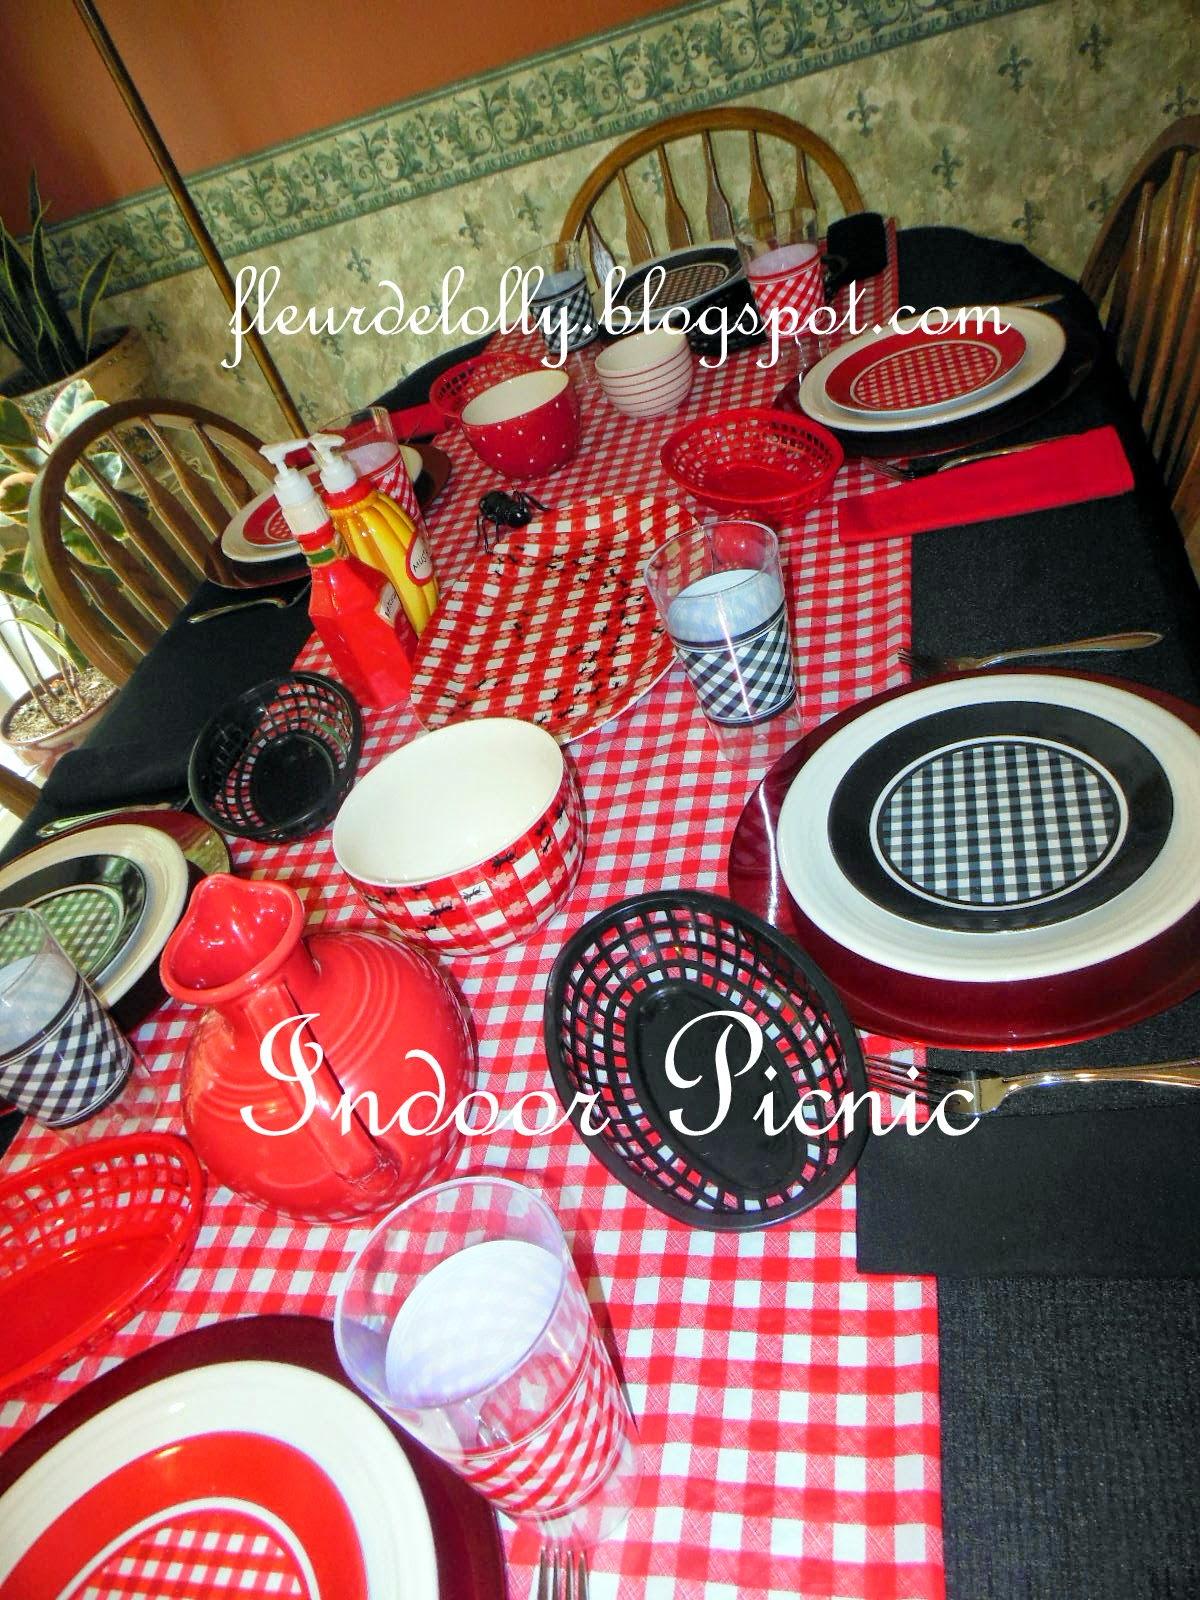 Fleur De Lolly Indoor Picnic Table Setting